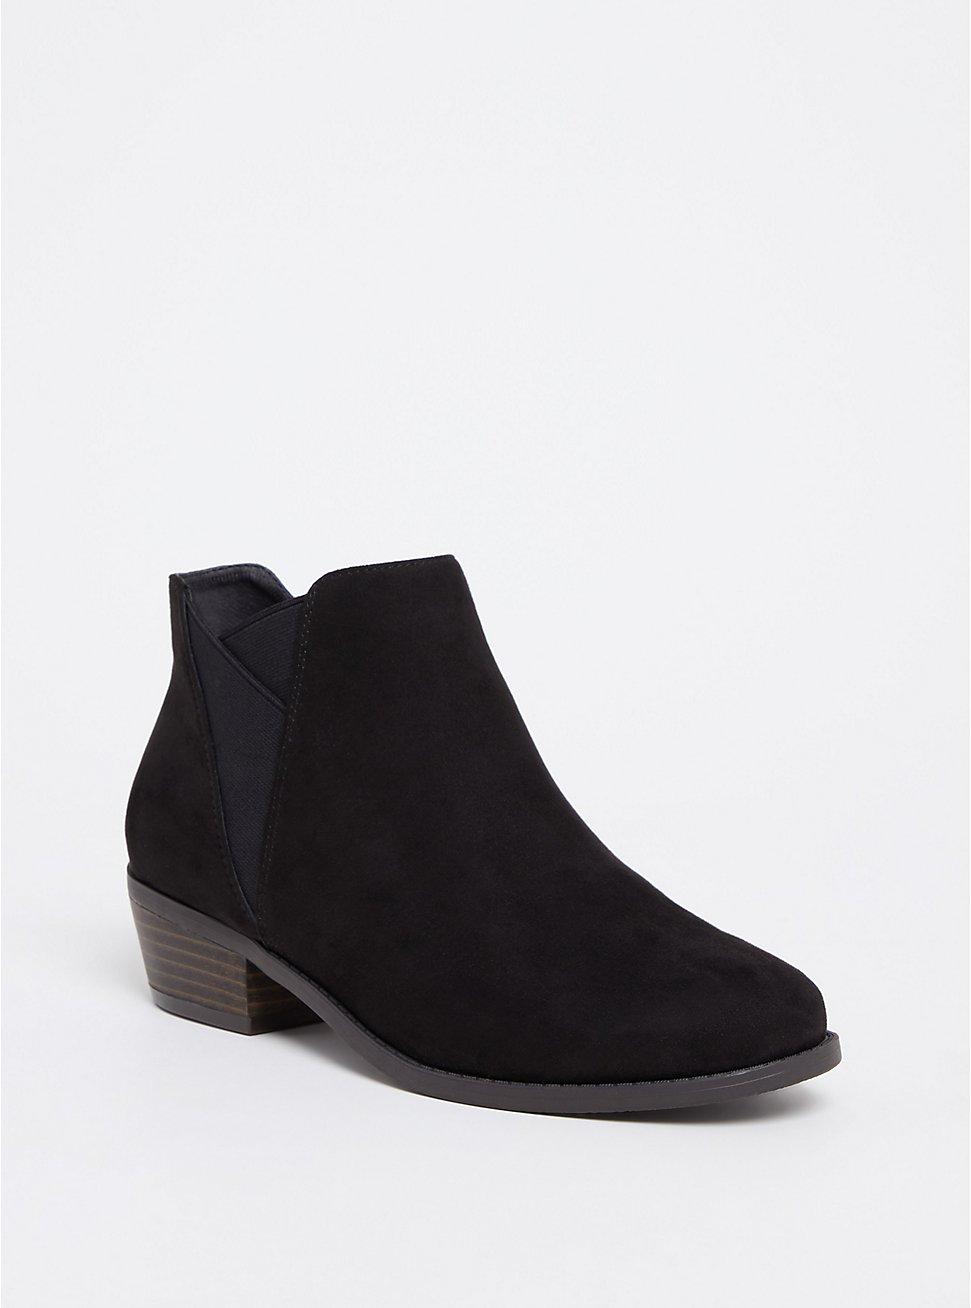 Black Faux Suede Ankle Boot (WW), BLACK, hi-res